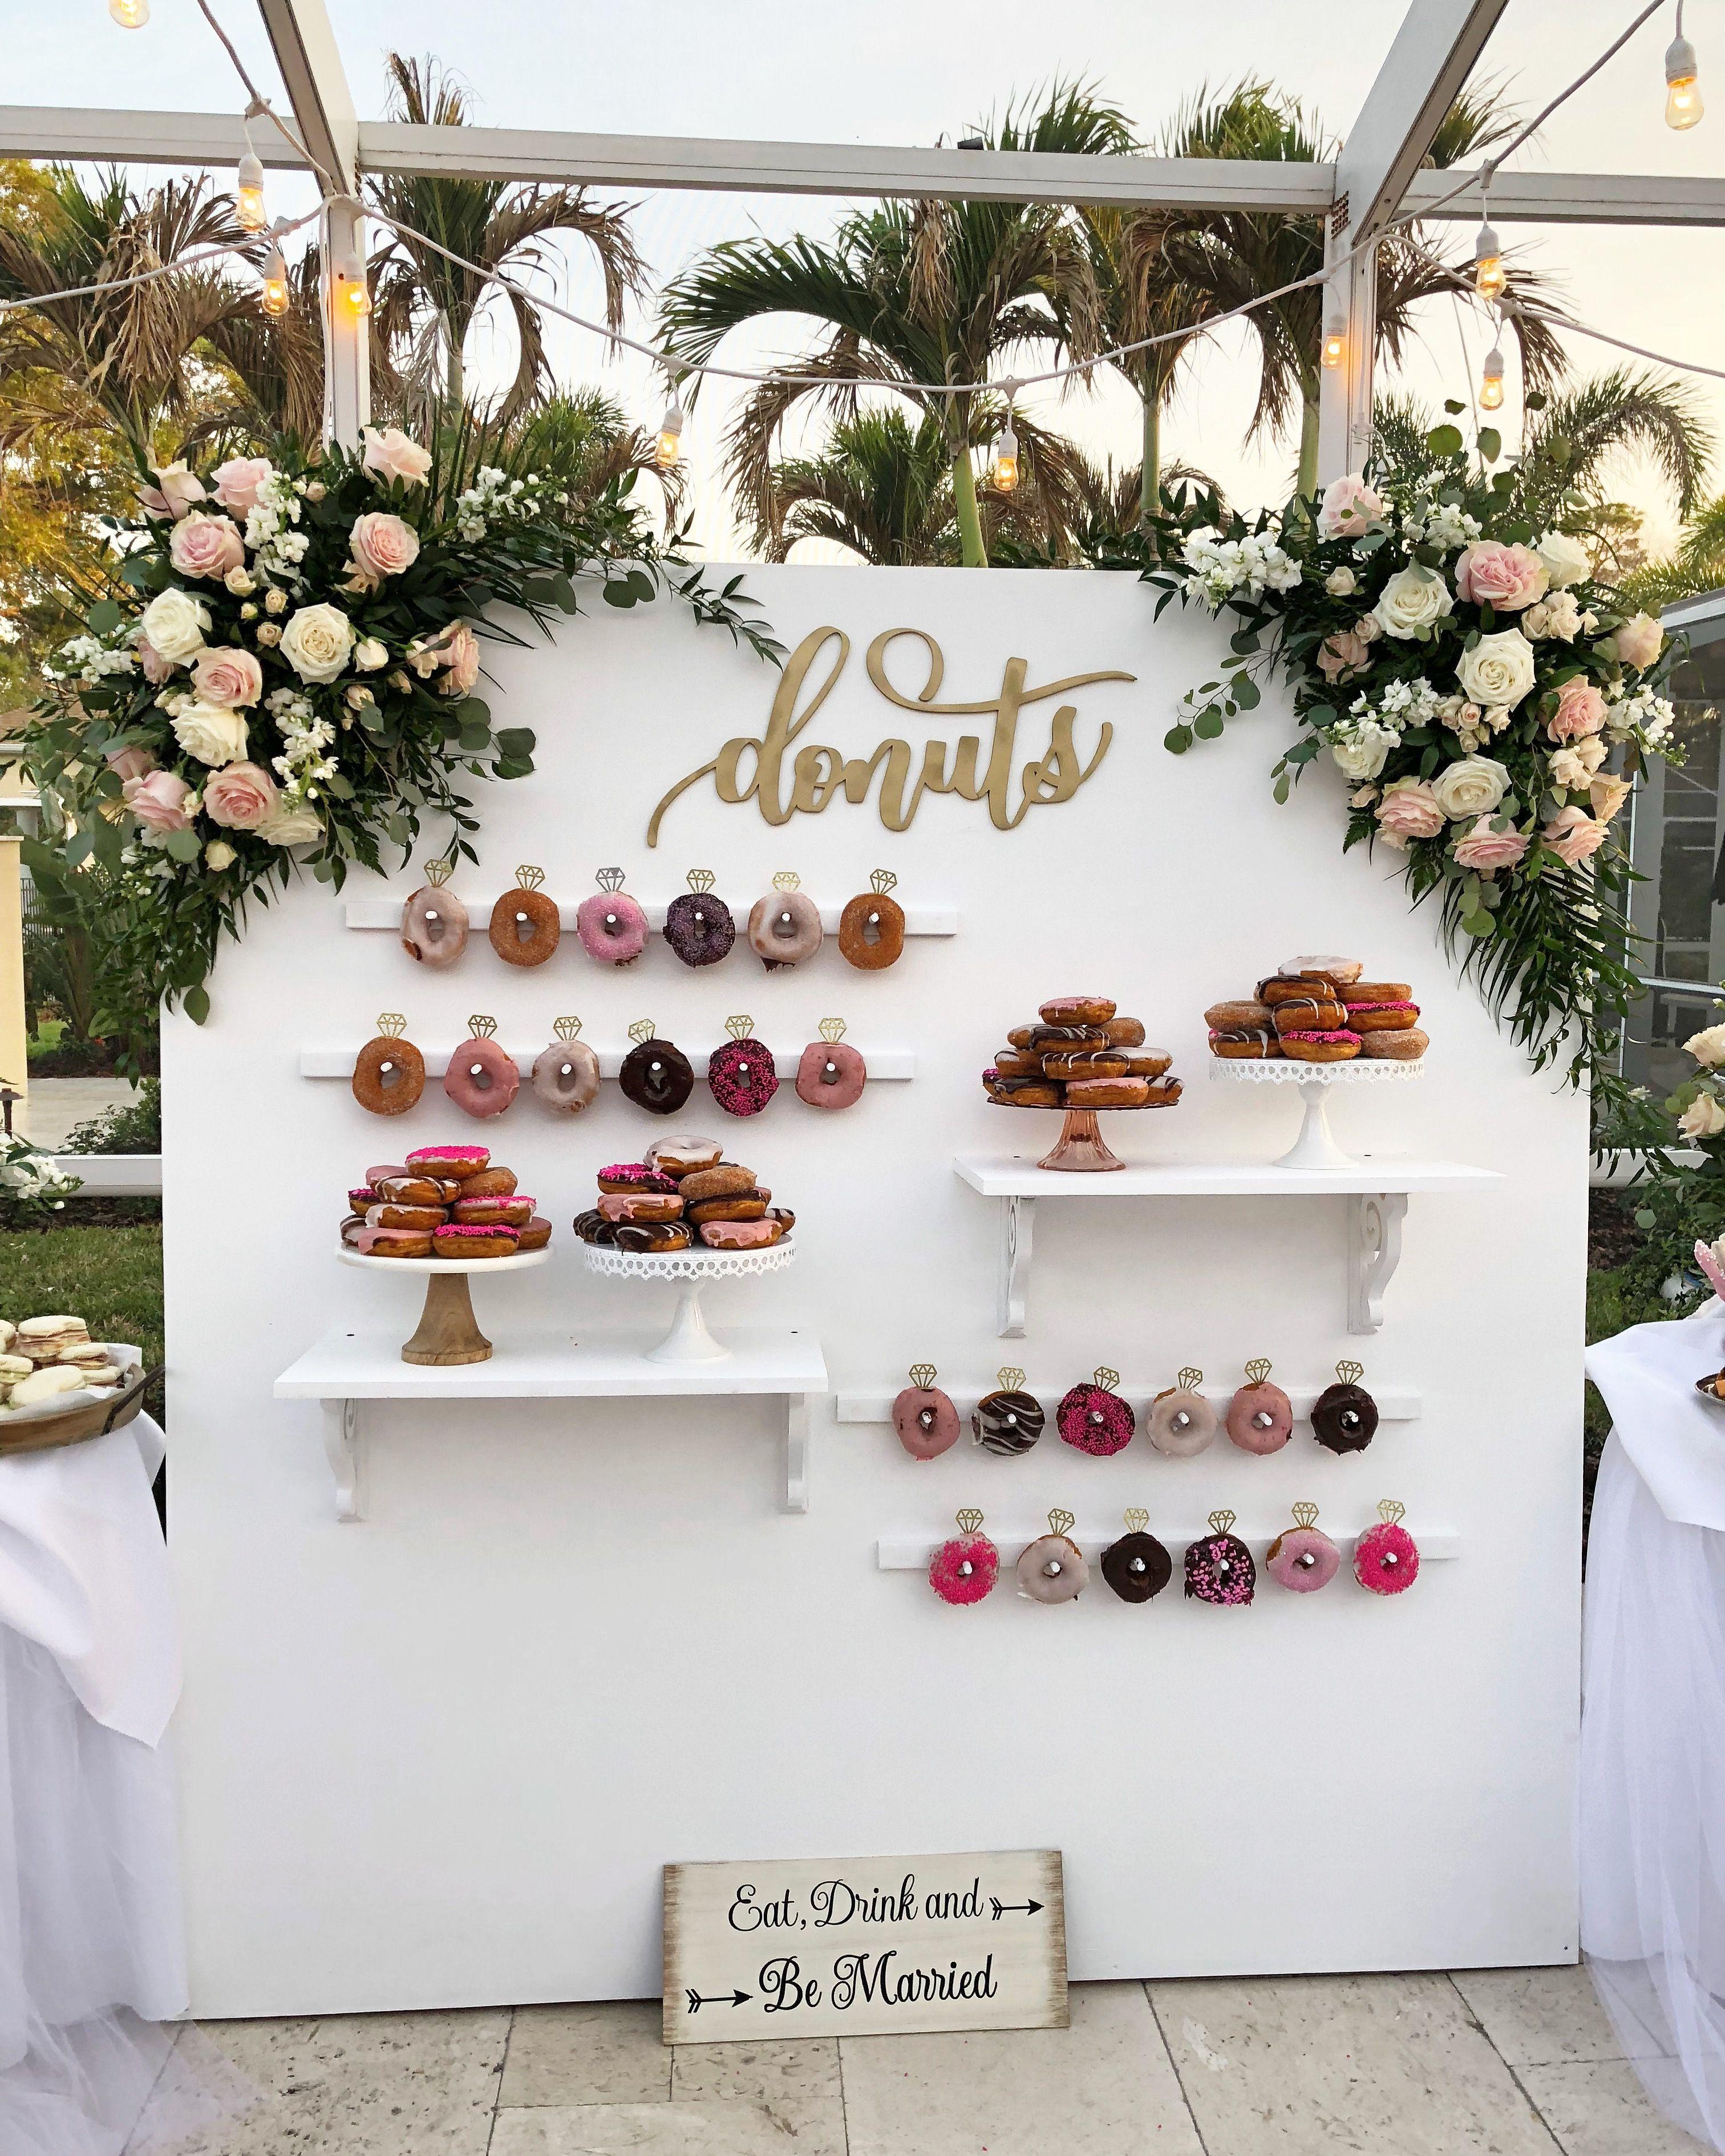 7 Popular Wedding Trends For 2019 According To Pinterest Wedding